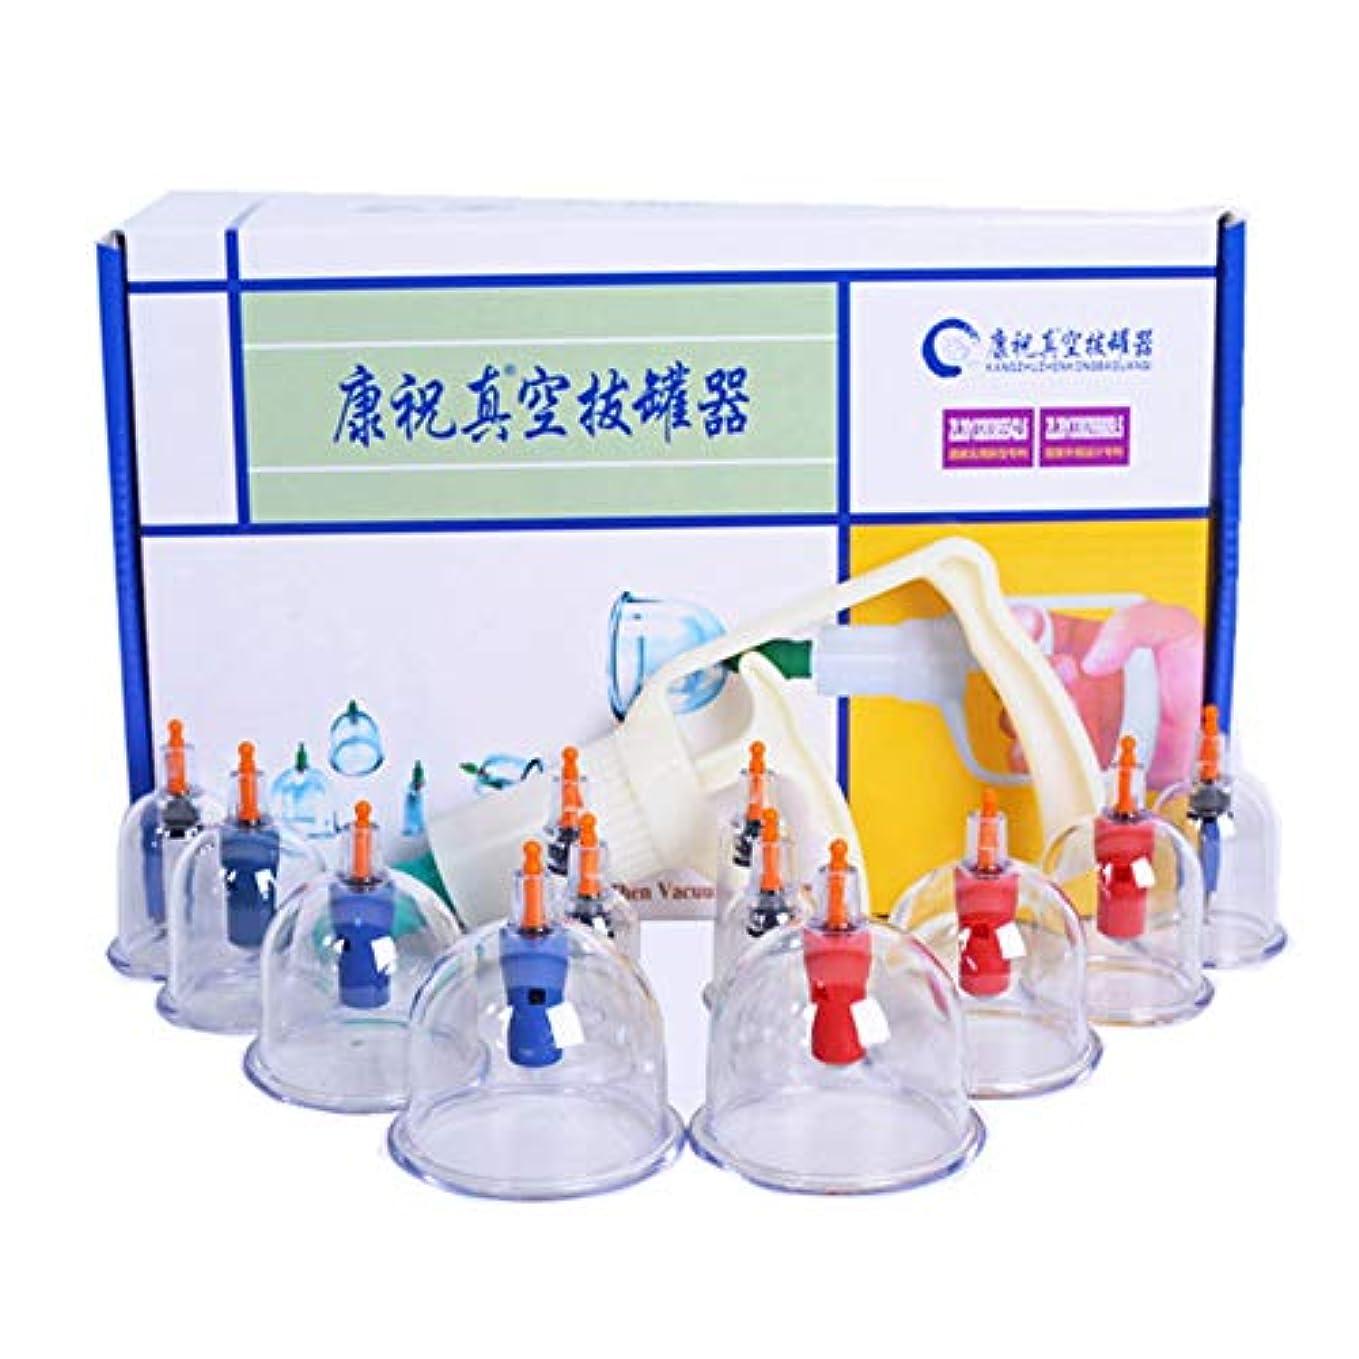 Wecandoカッピング 吸い玉カップ 真空 マッサージ 関節と筋肉痛救済 手動ポンプ式 プラスチック製 6個 12個 24個 (12個)